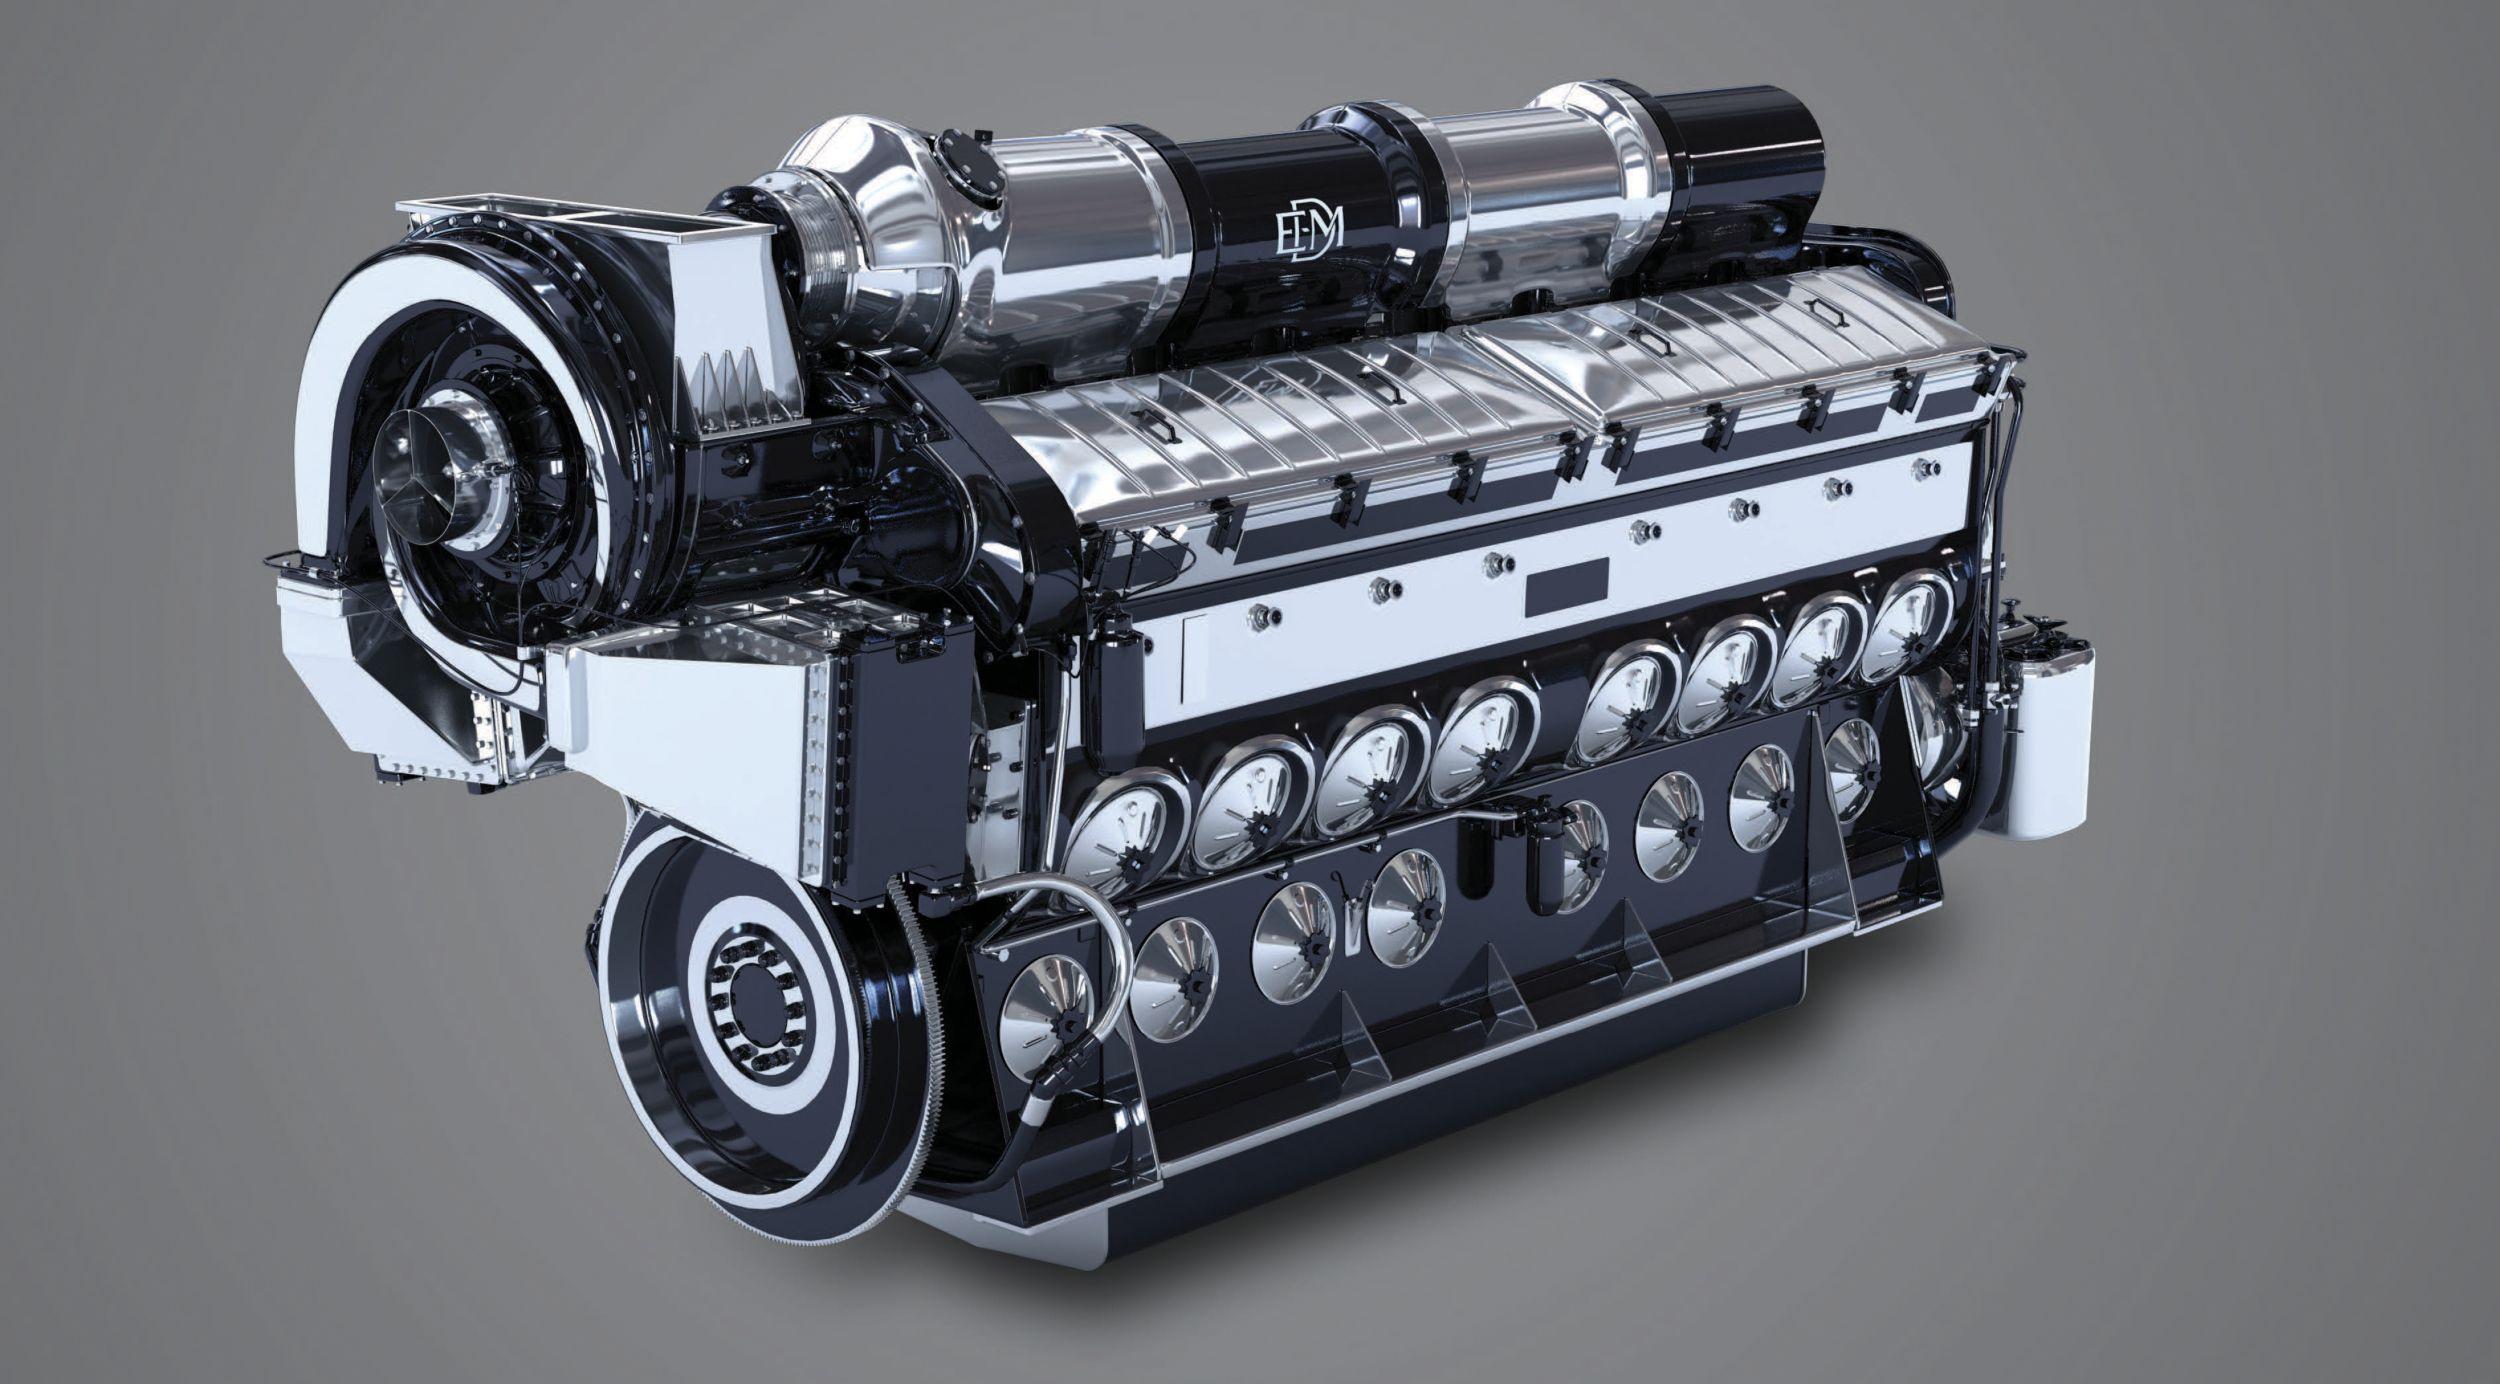 Progress Rail | EMD 710 Locomotive Engine